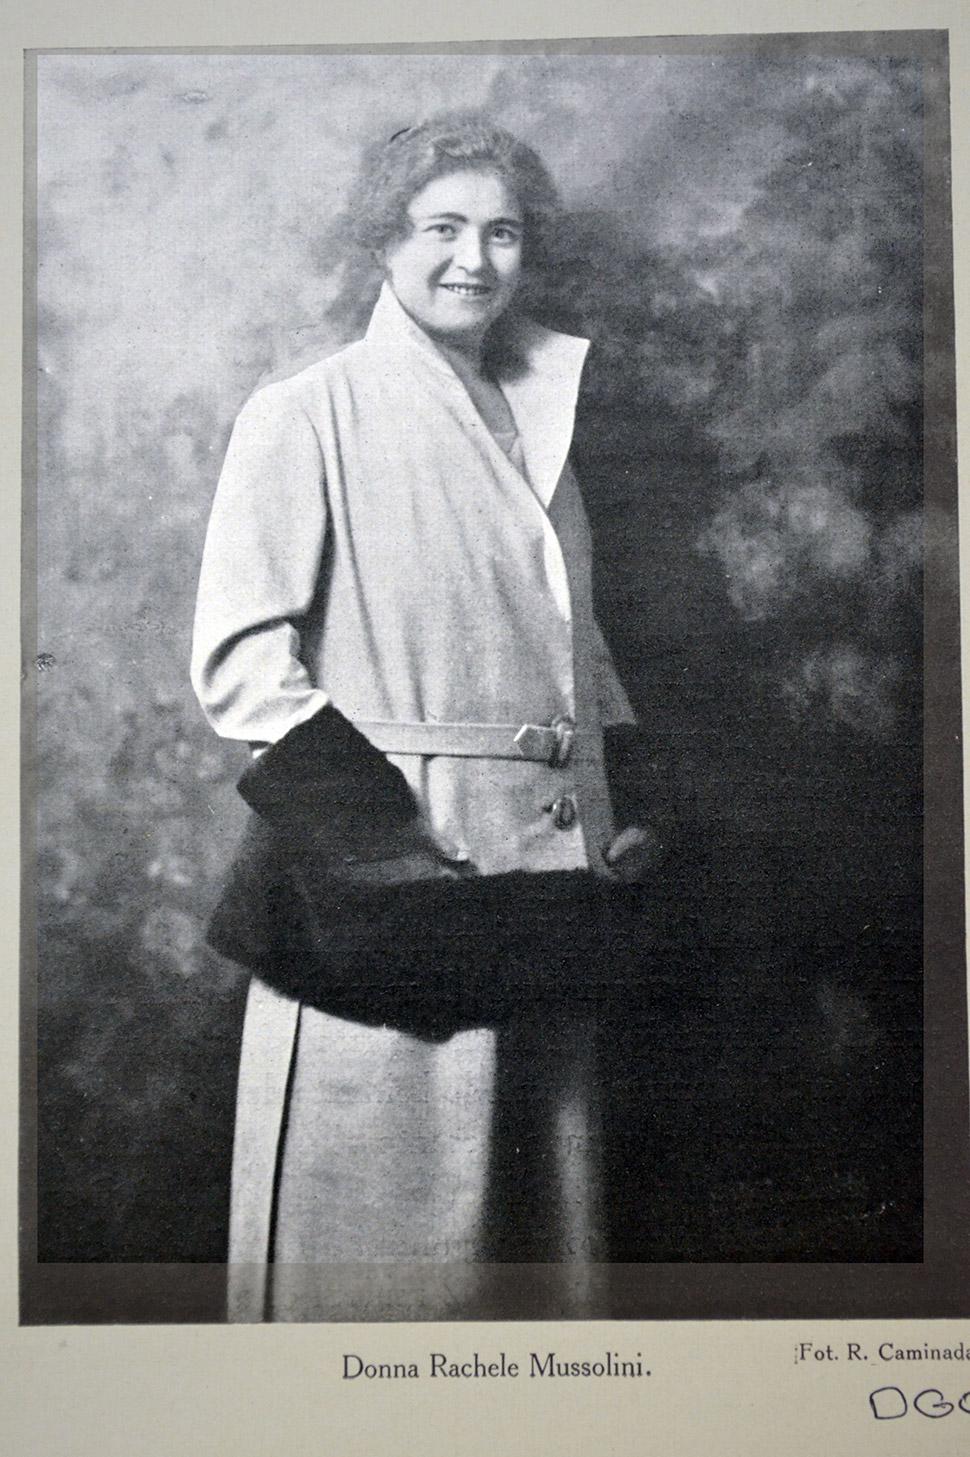 Супруга диктатора донна Ракеле Муссолини в 1924 году. Universal History Archive/REX/Shutterstock Что